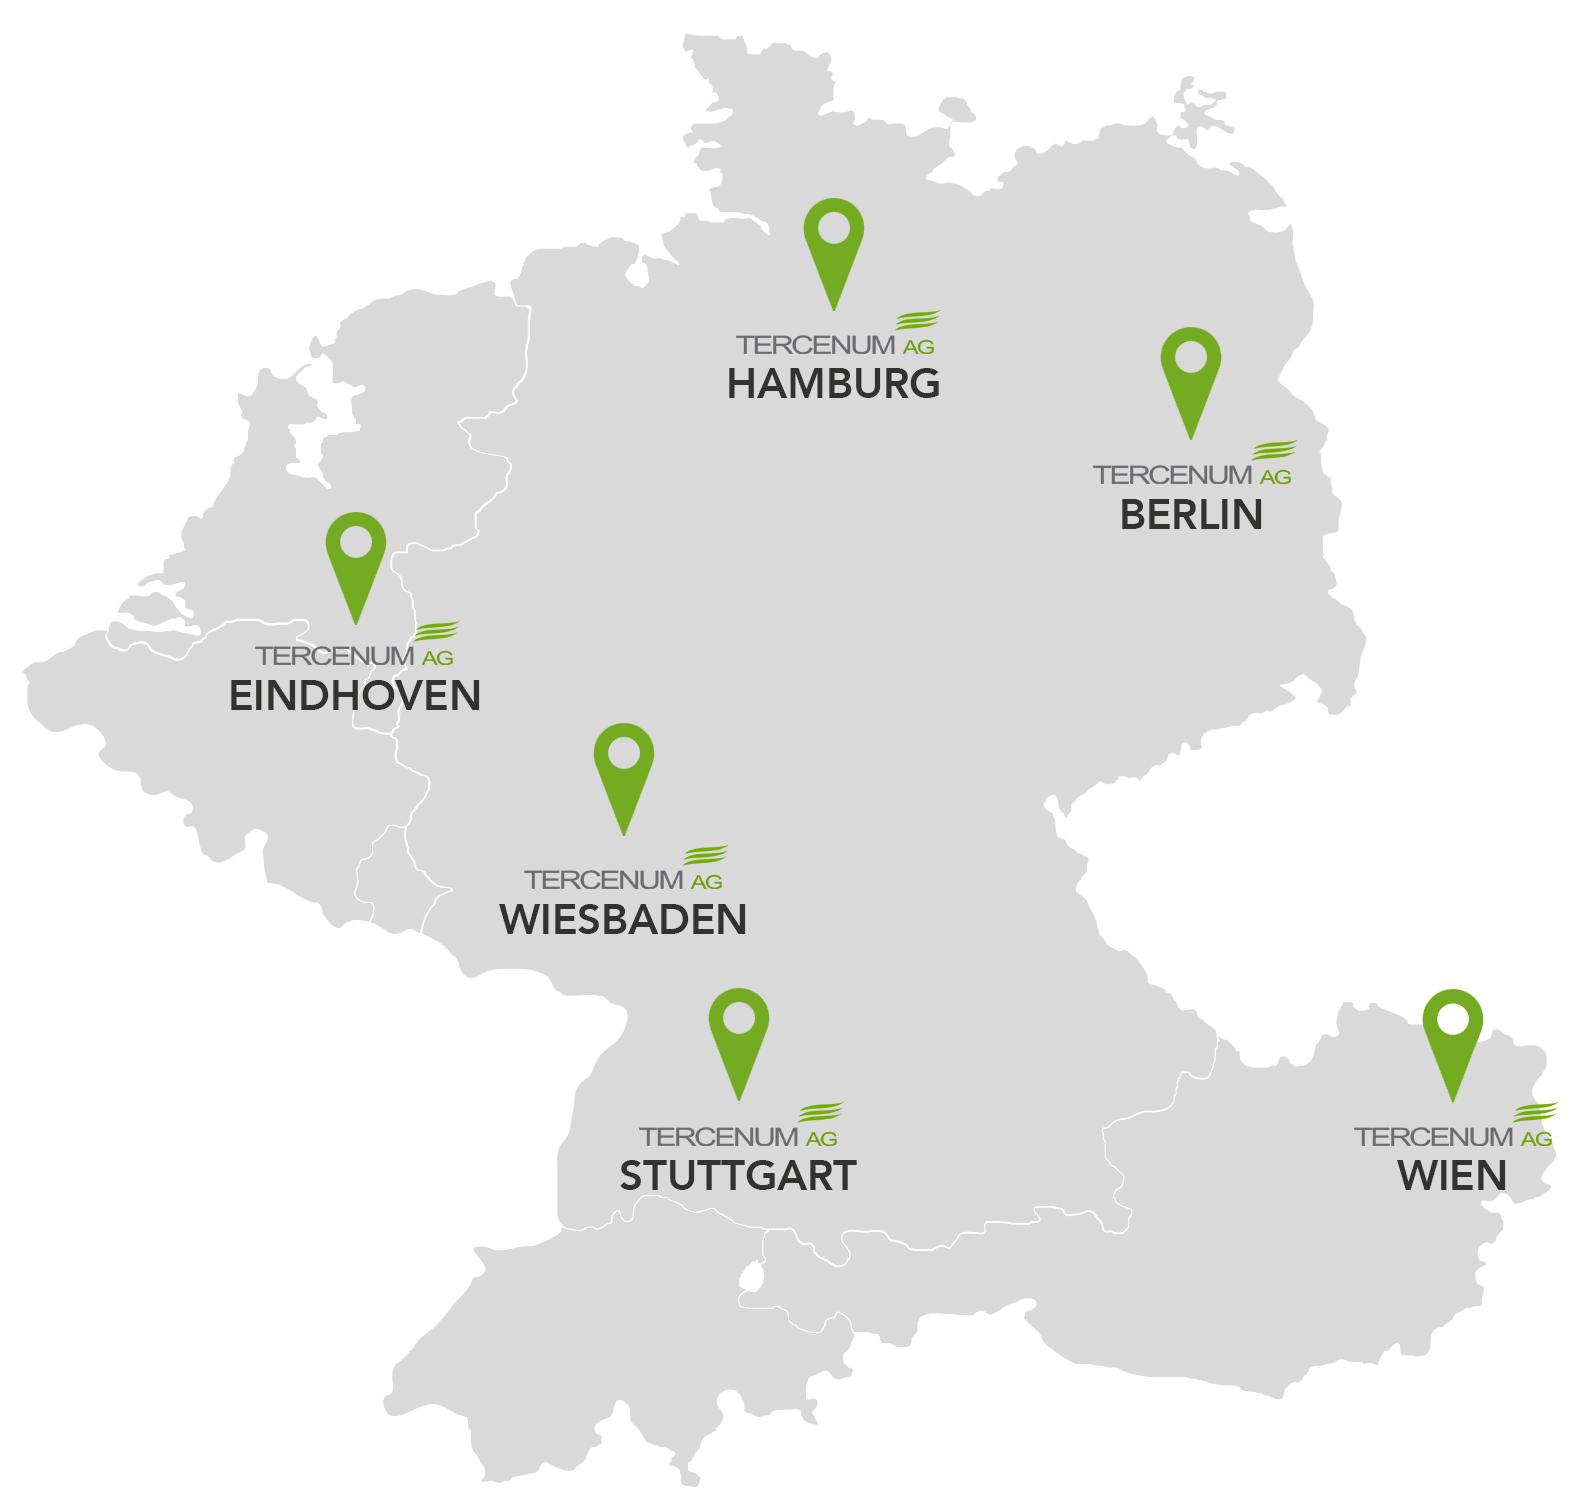 Standorte der TERCENUM AG